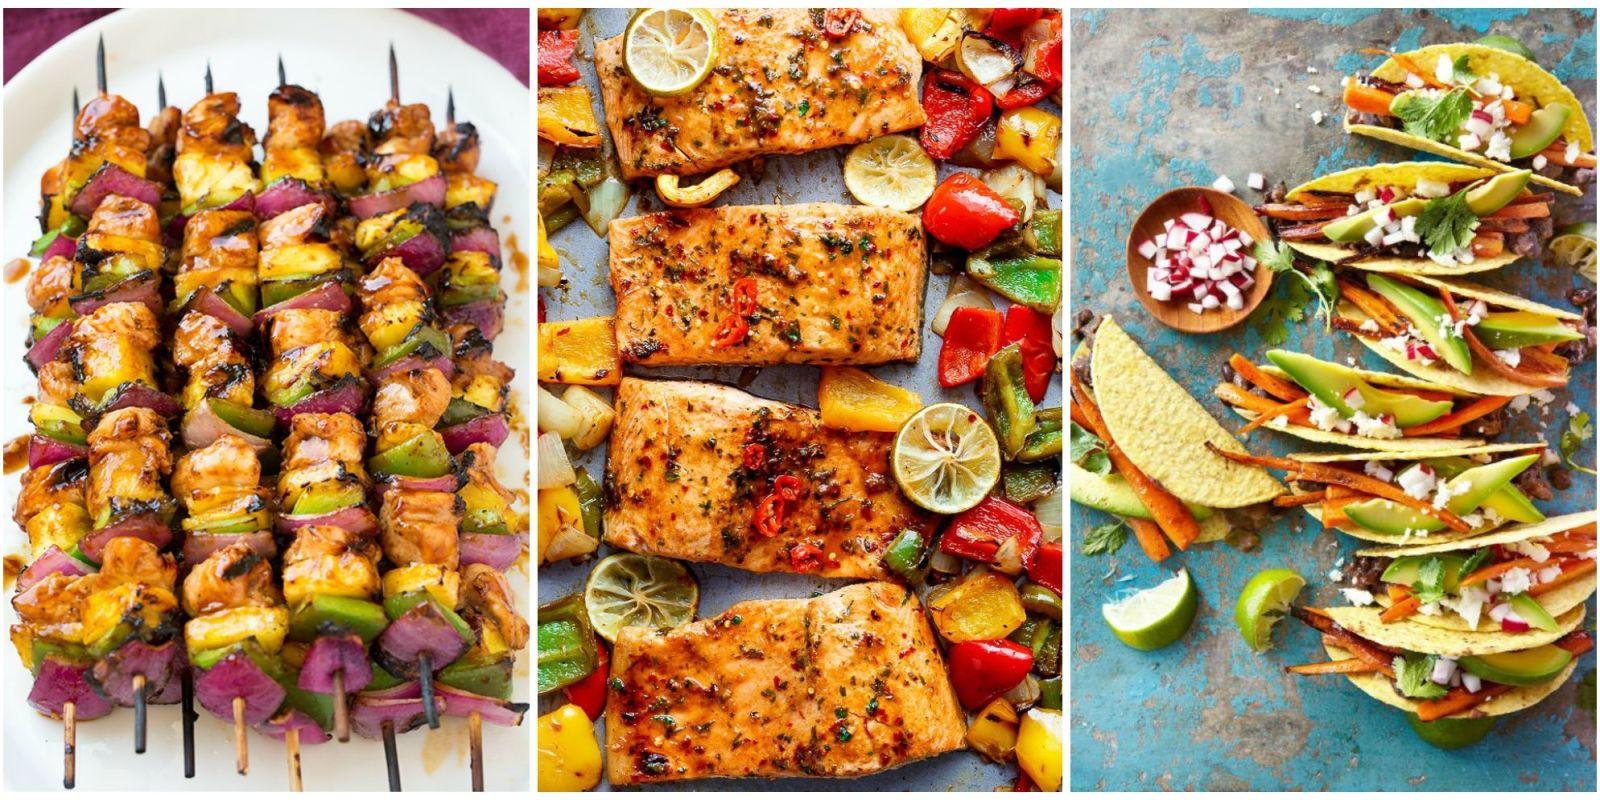 Summer Dinner Recipes  14 Easy Summer Dinner Ideas Best Recipes for Summer Dinners